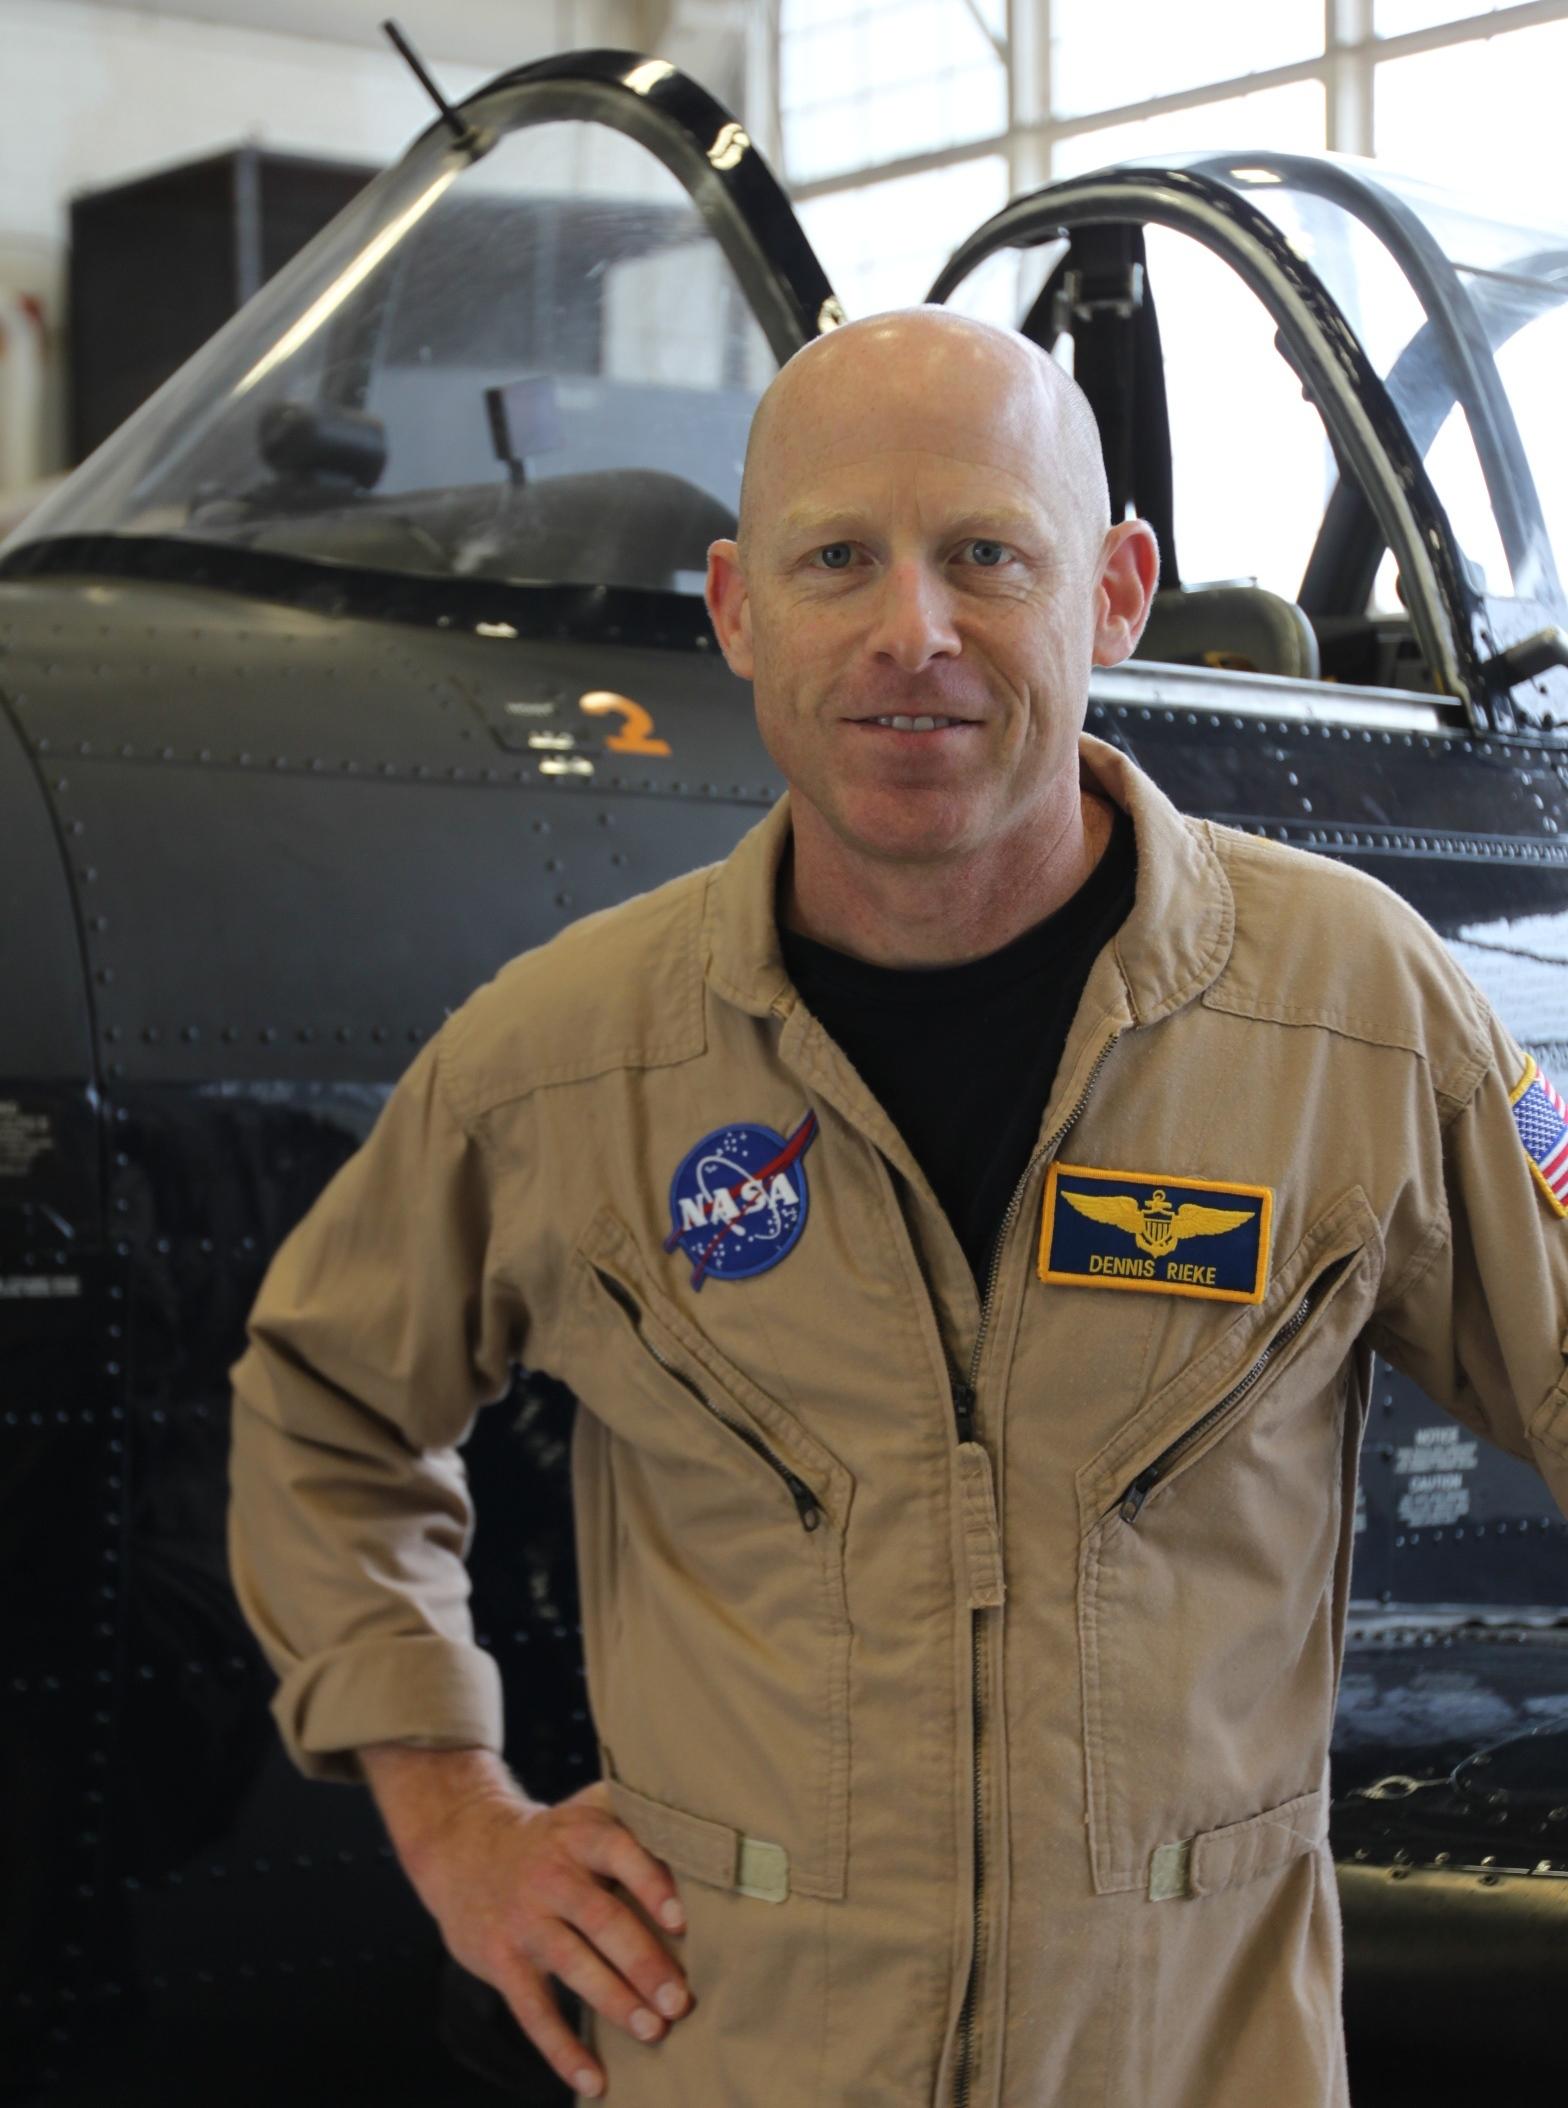 NASA Wallops Pilot Biography: Dennis Rieke | NASA